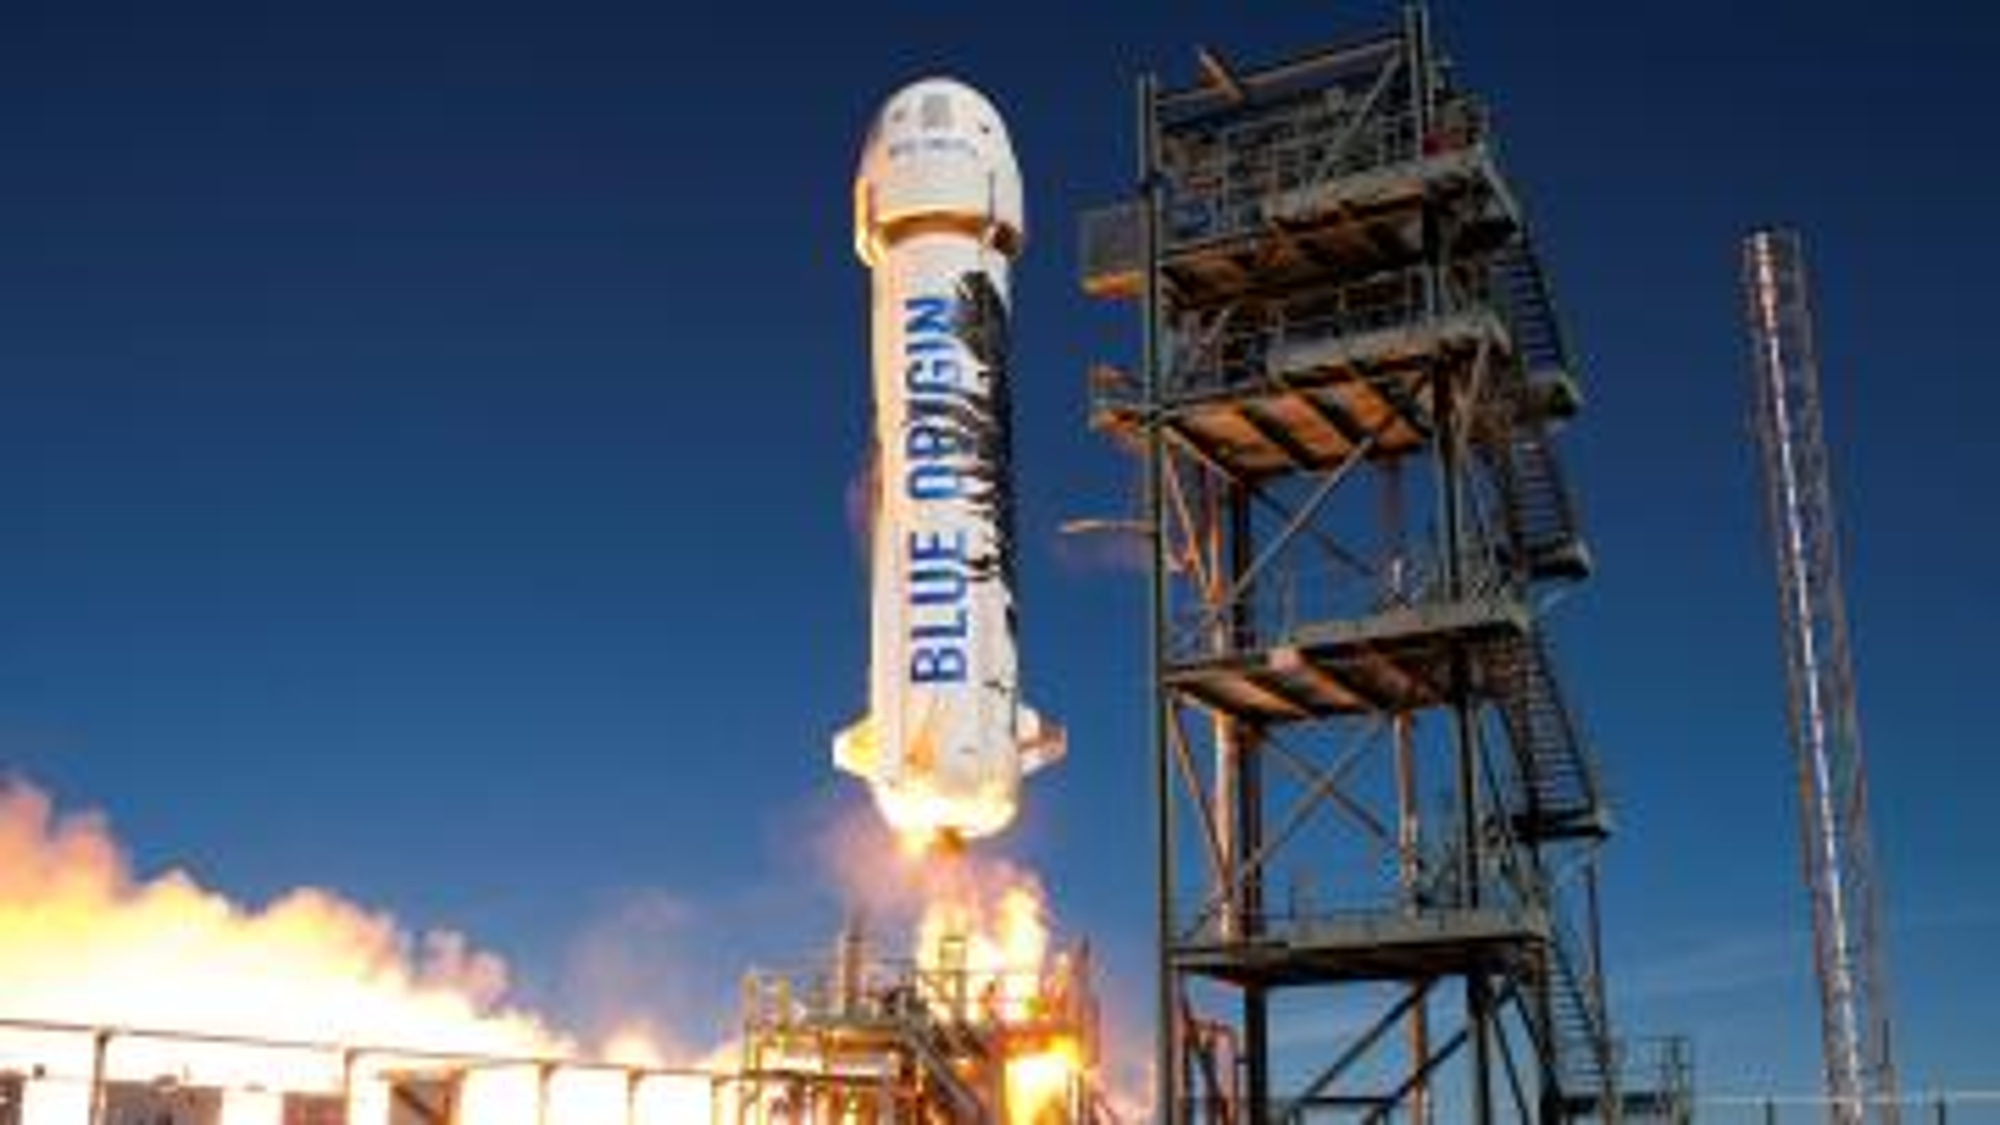 Blue Origin's New Shepard spacecraft launches in 2016.